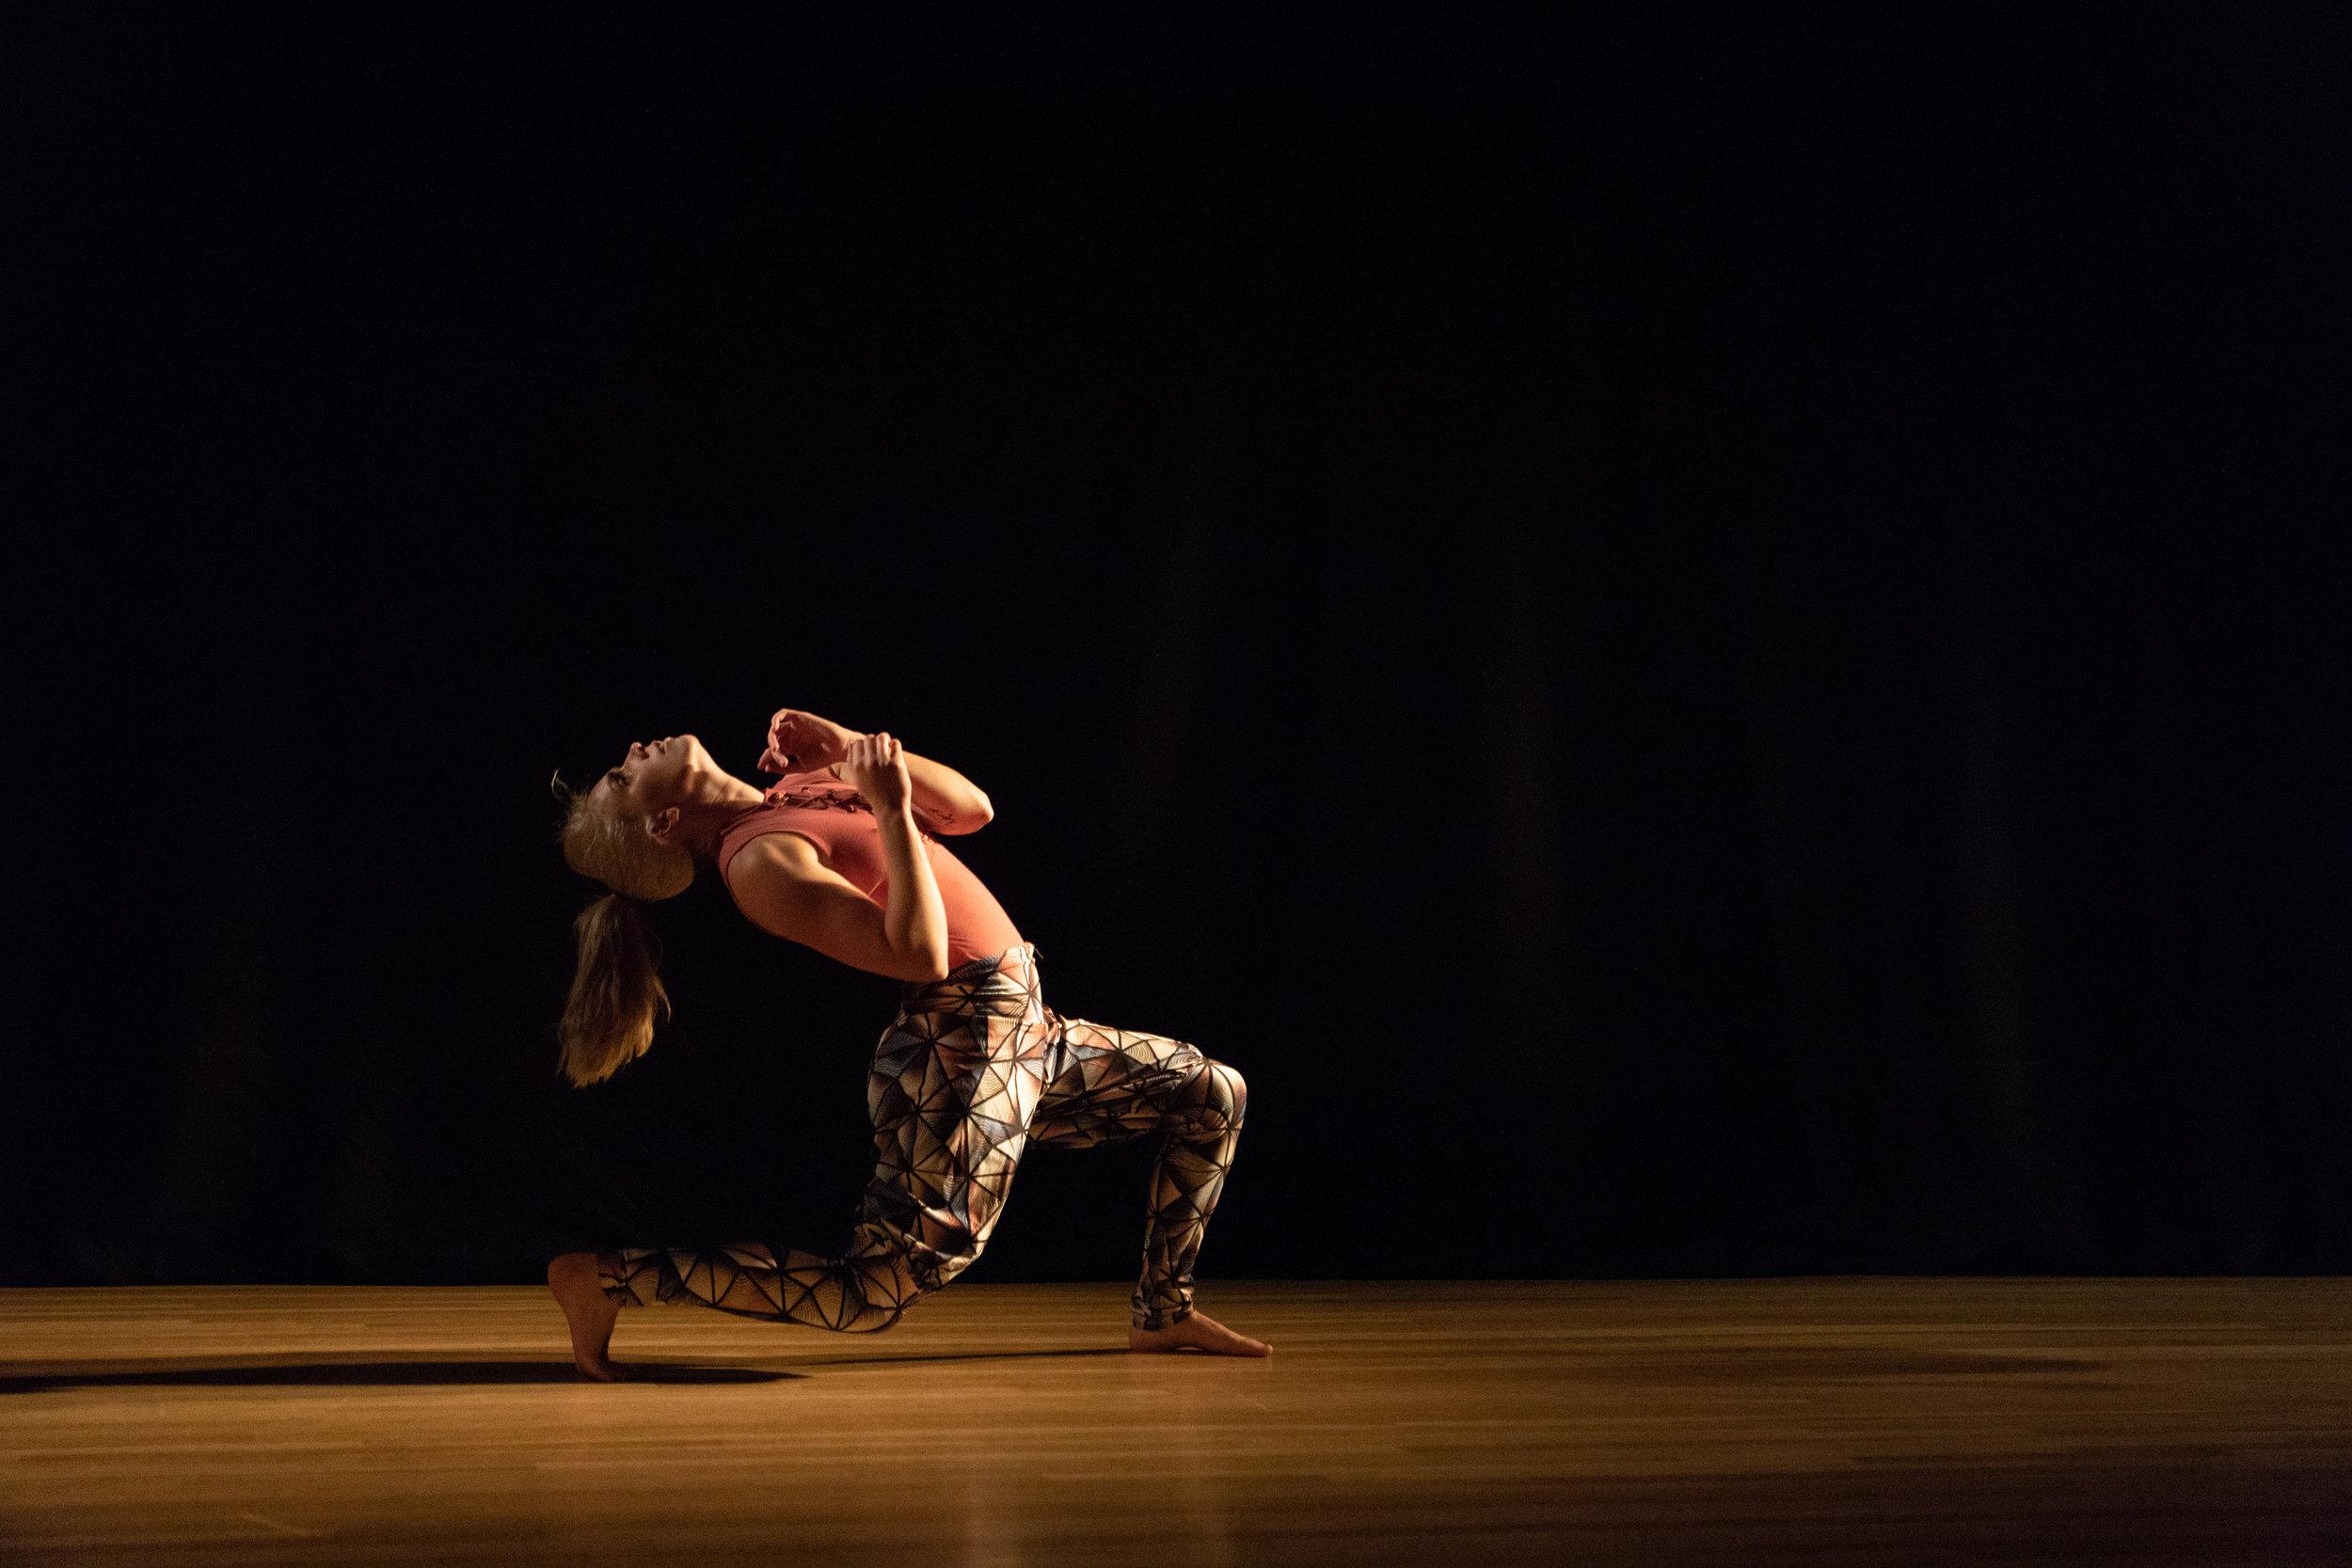 Choreograper:    Joseph Heitman     Dancer:    Dana Mazurowski    Photo by Joseph Heitman of One Day Dance